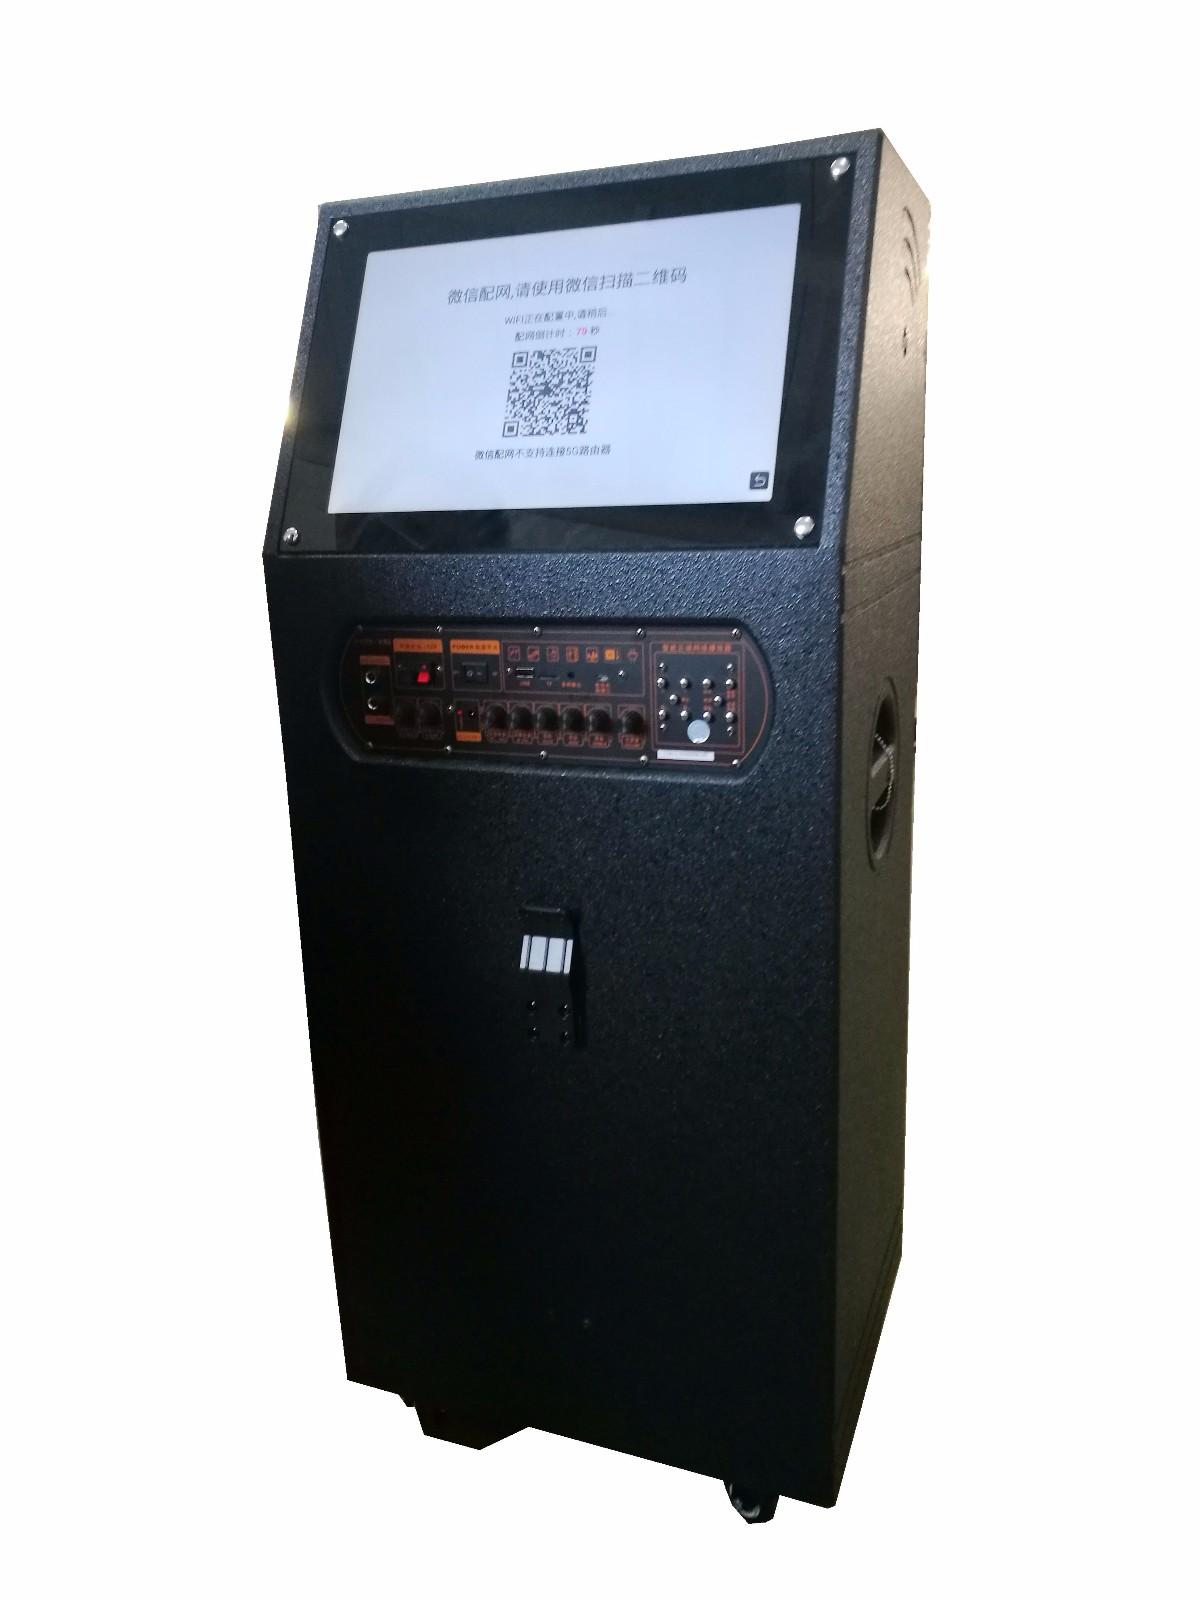 SA-8209 15.4inch LED  double  12 inch woofer base  (1).jpg